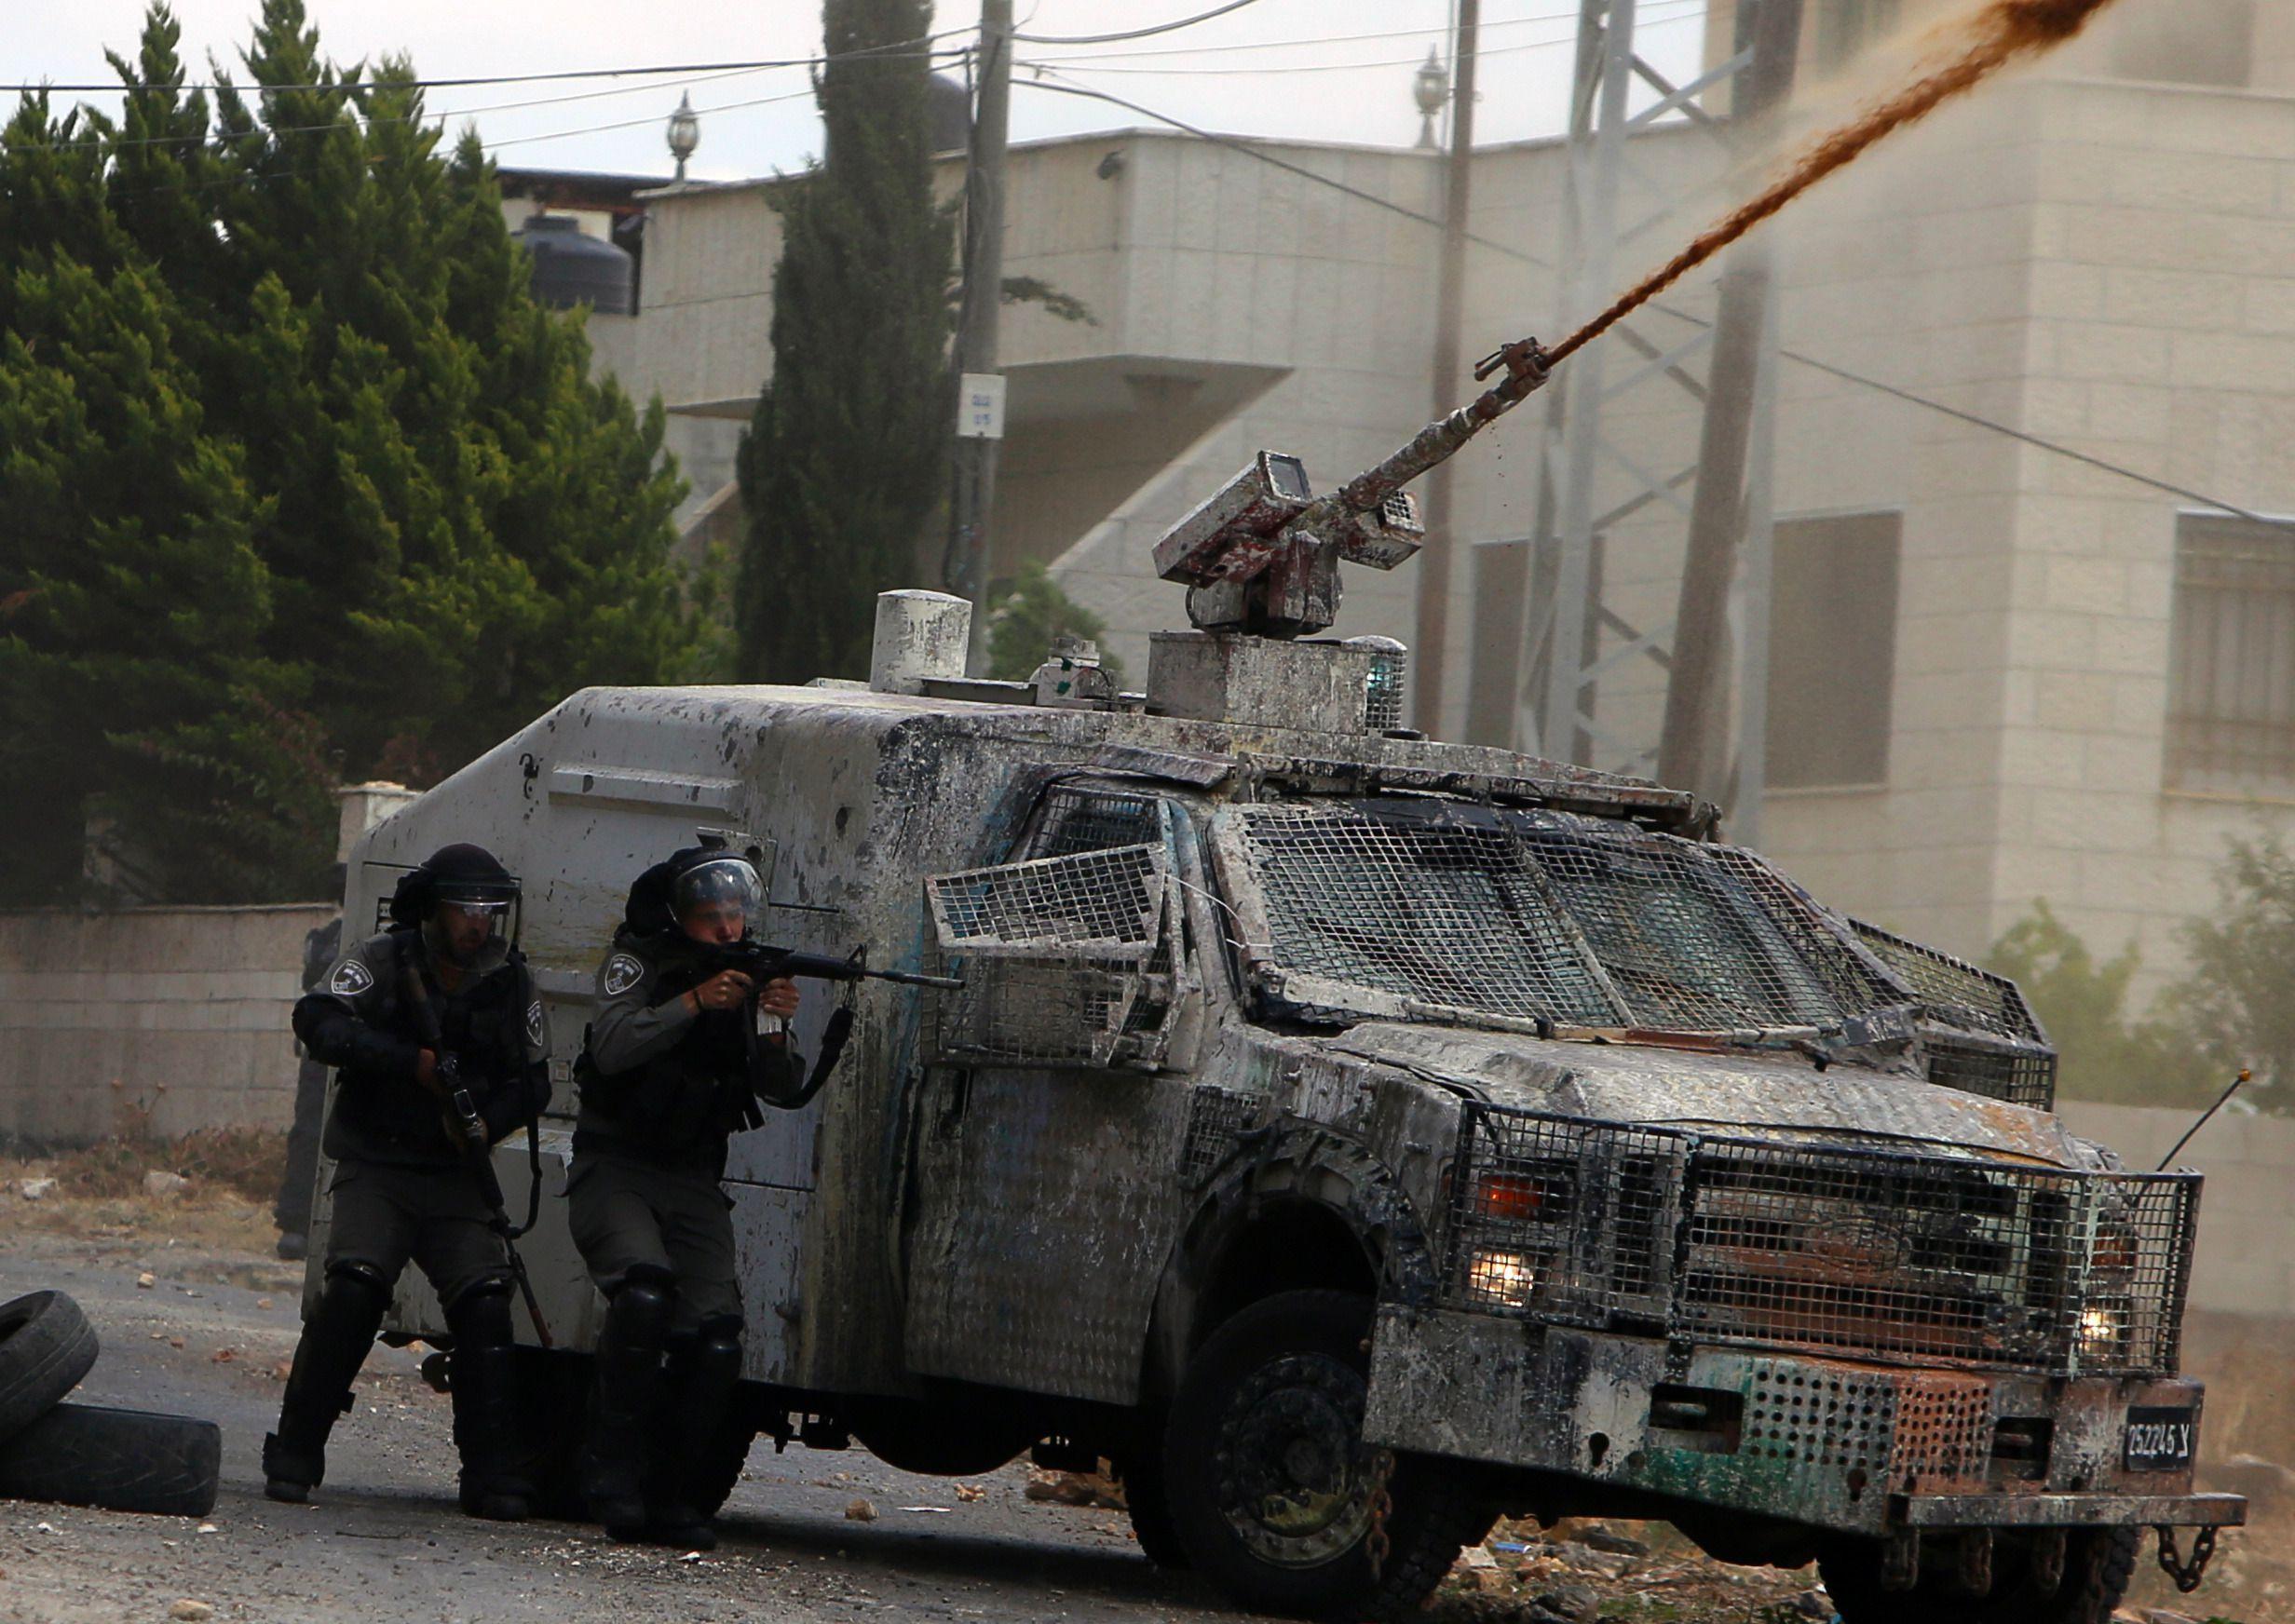 Israeli security forces on May 27, 2016 in the village of Kfar Qaddum, near Nablus.